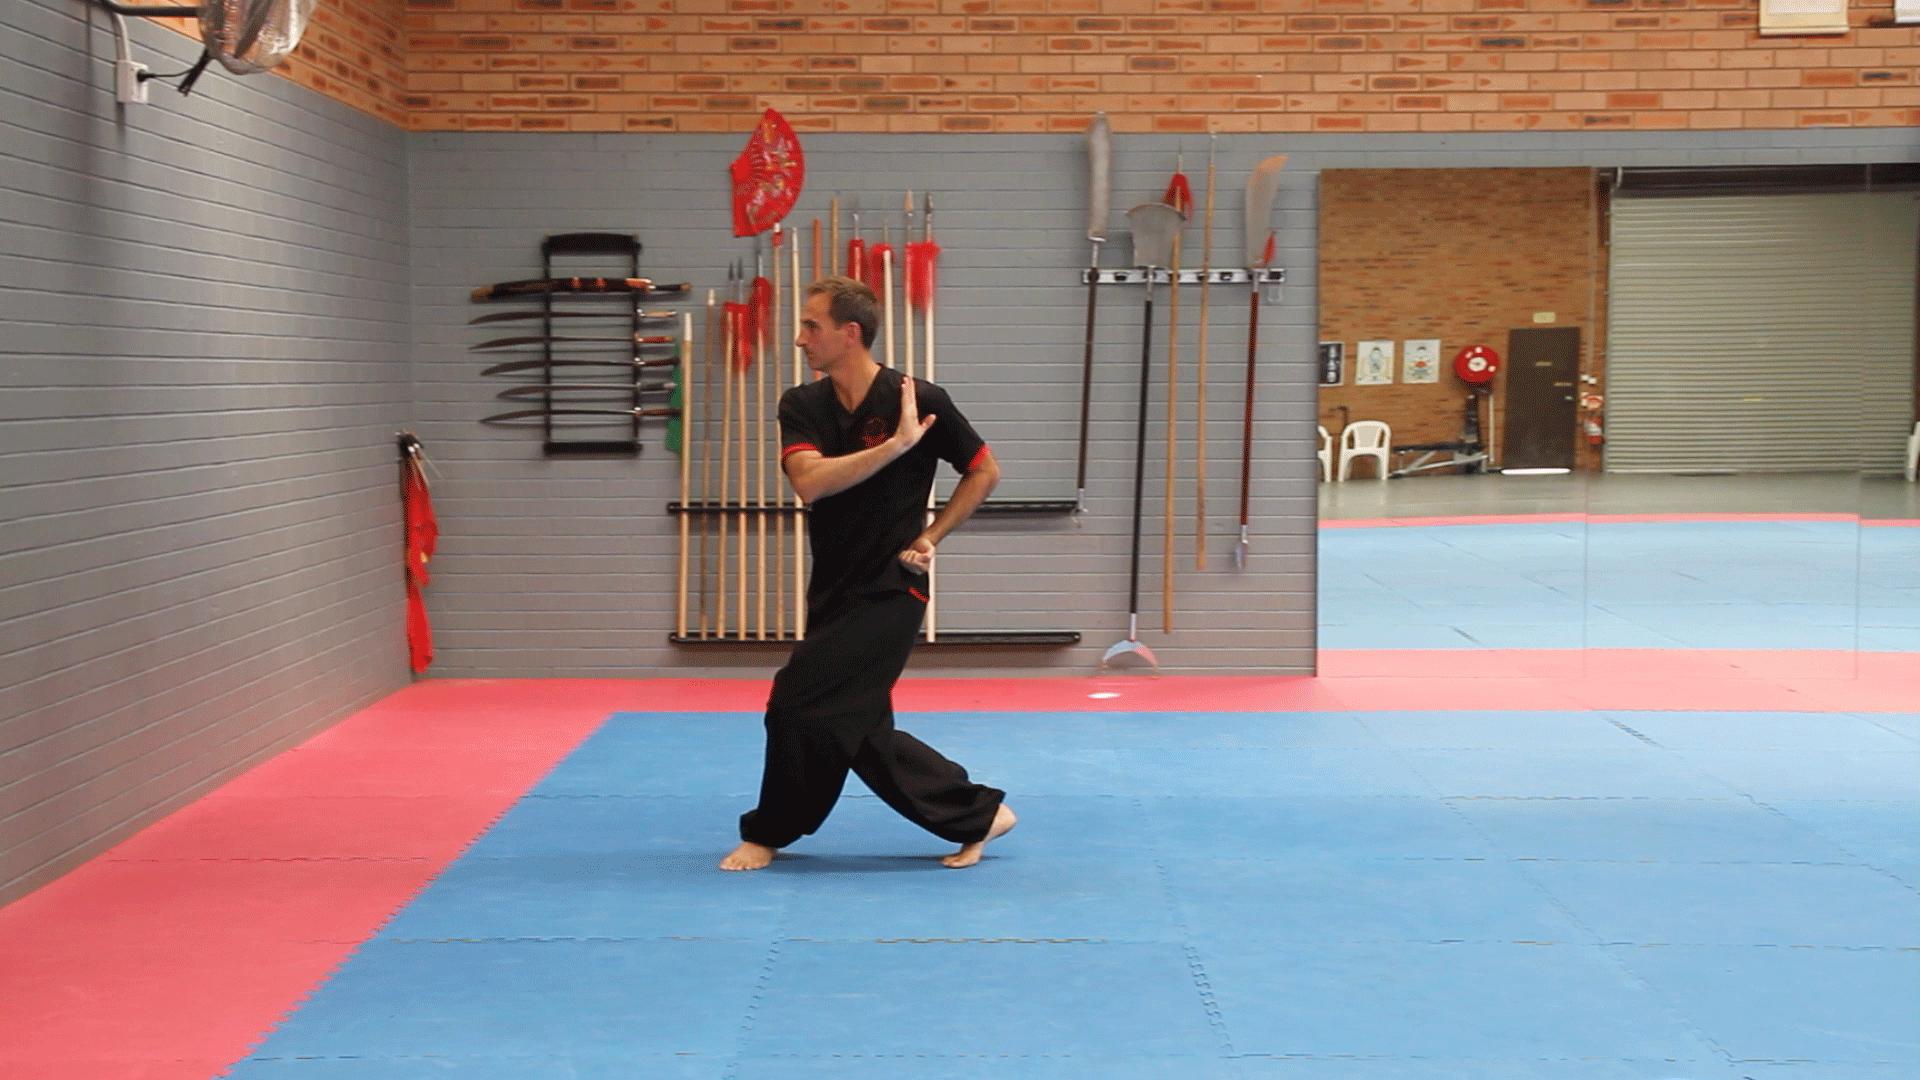 Sai Ping Kune – Four Flat Fist